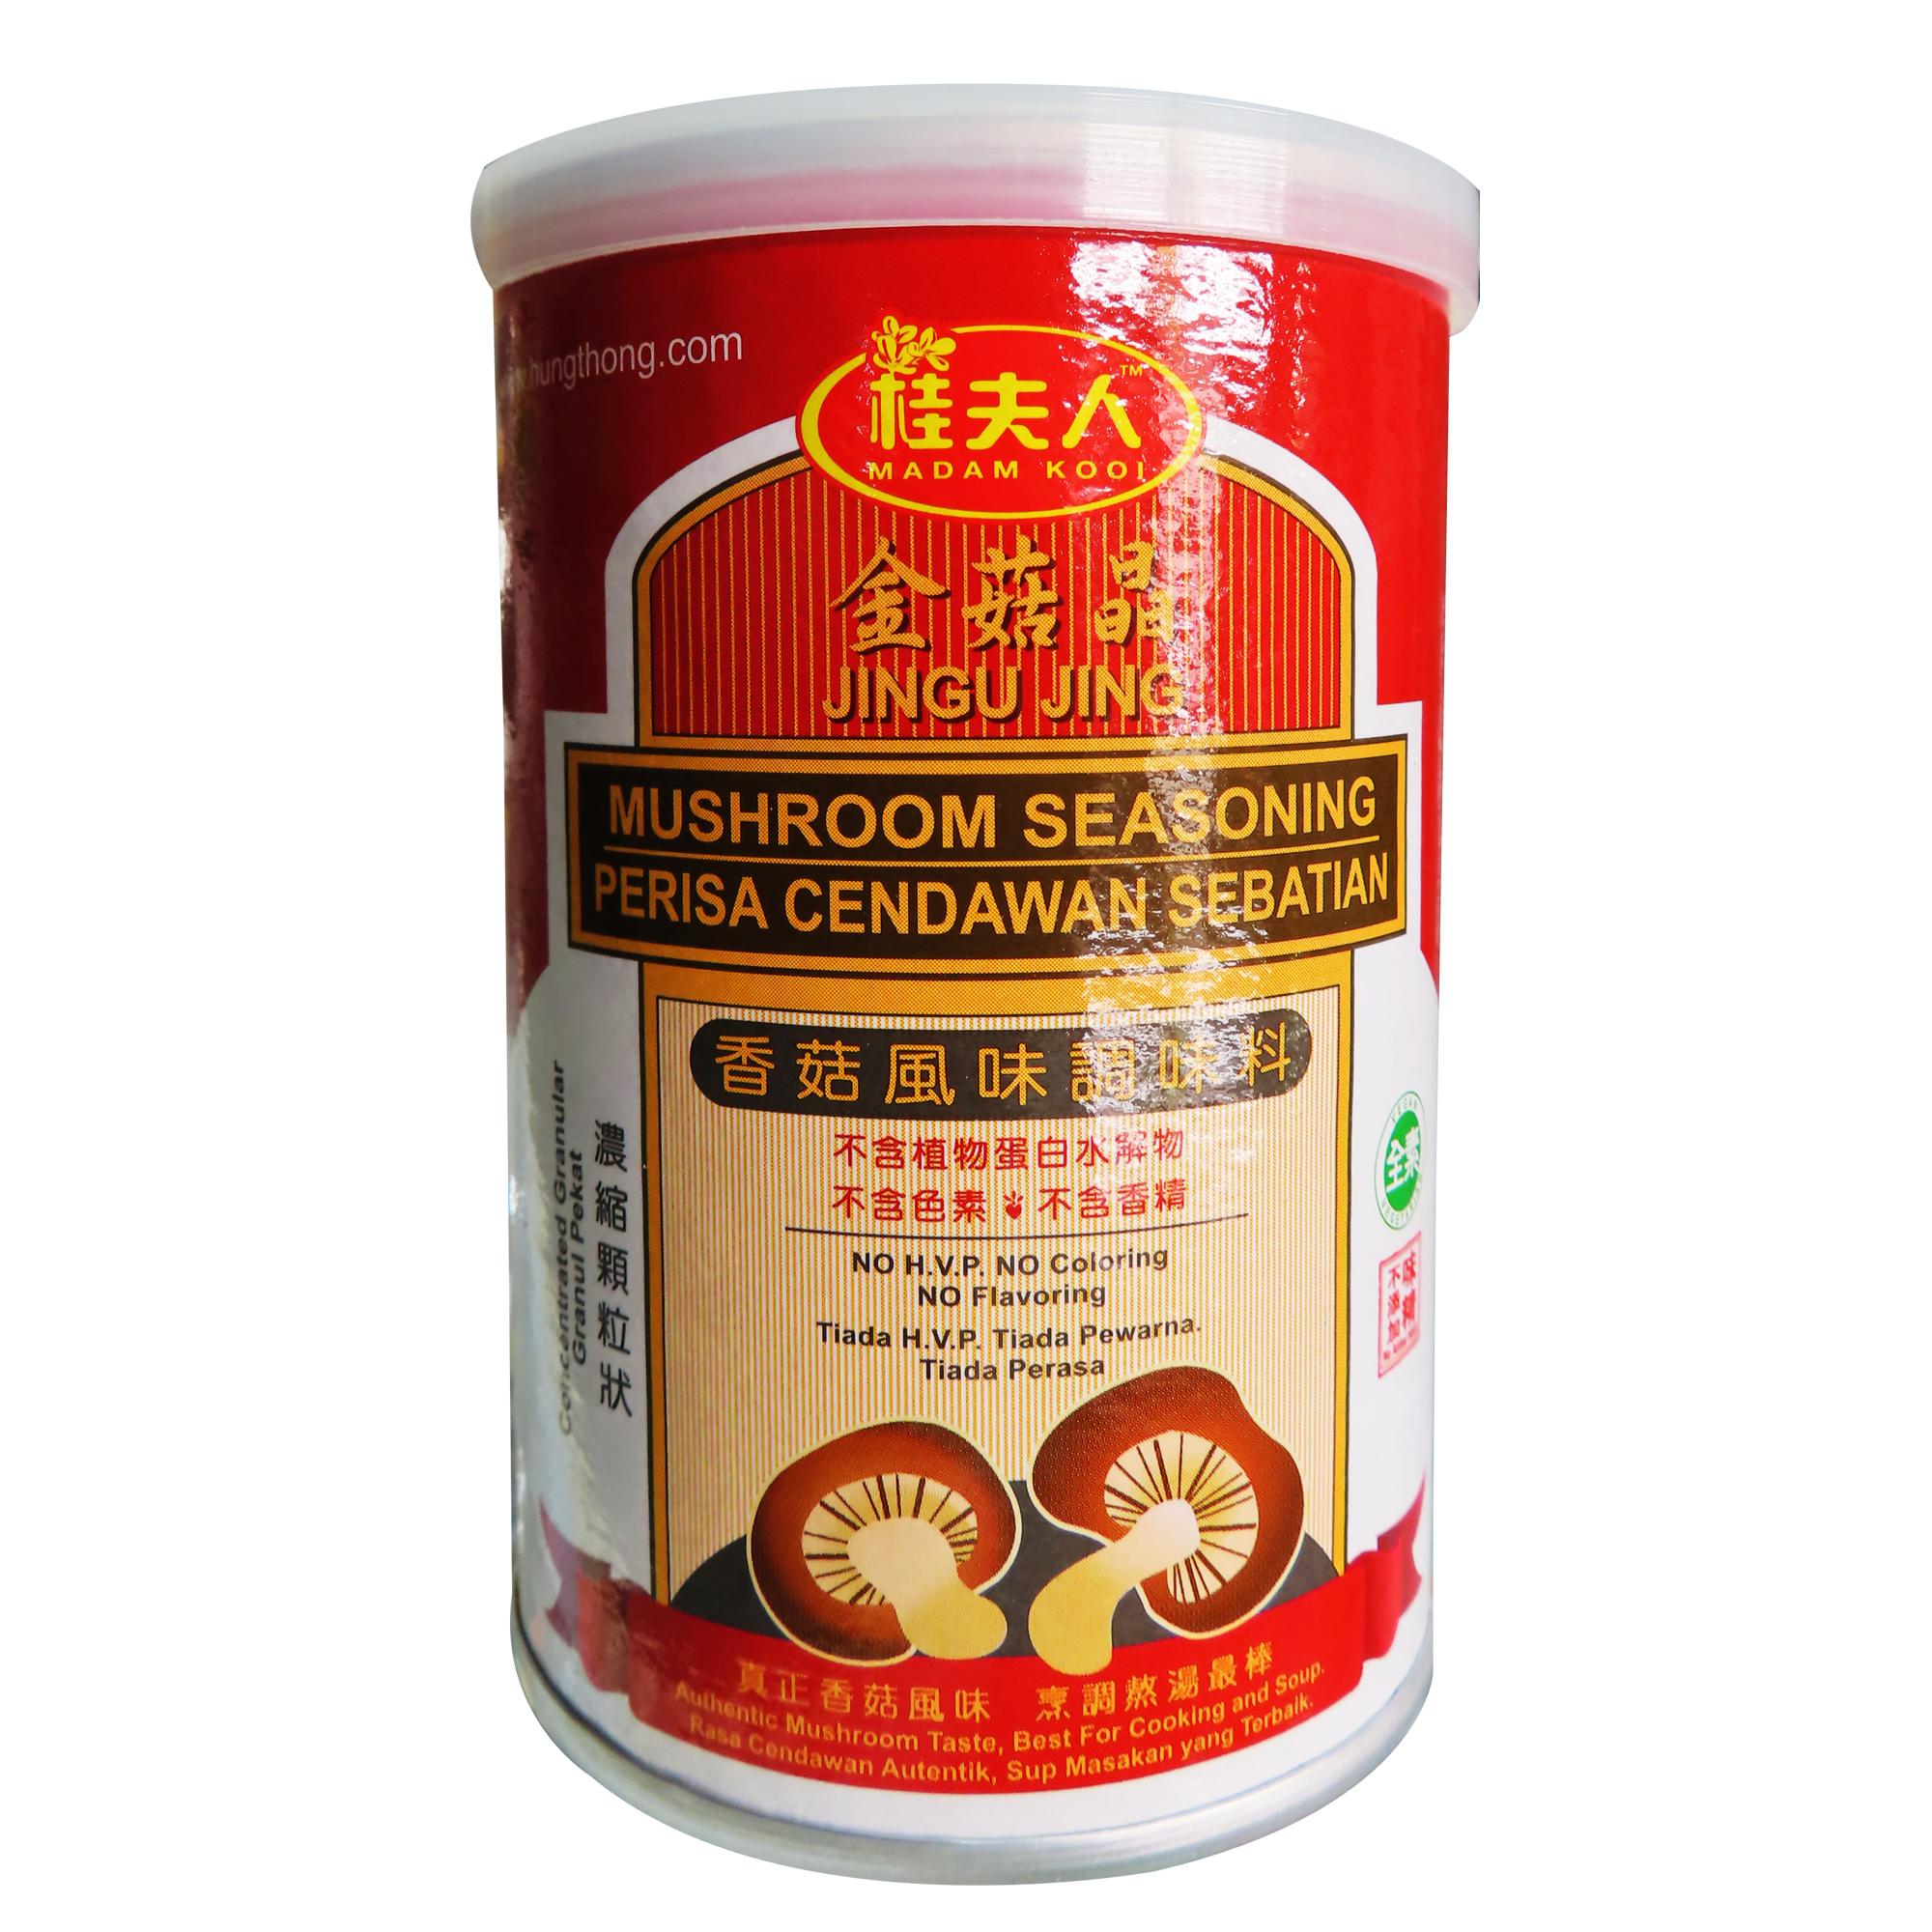 Image Mushroom Seasoning 桂夫人 - 金菇晶 (罐) 150grams